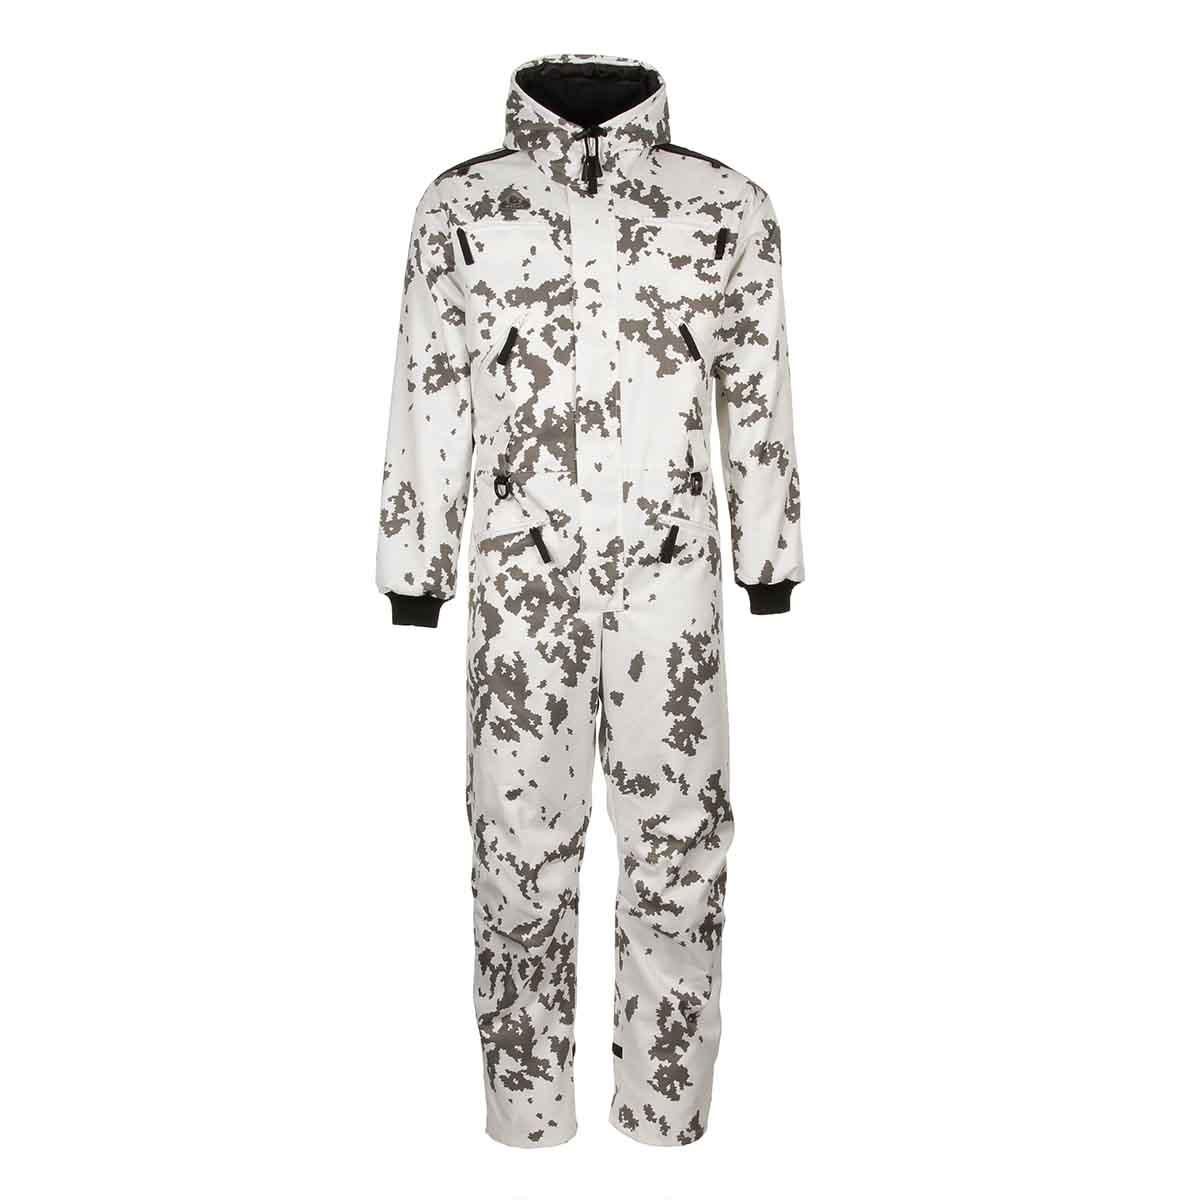 Hylje Snow Camo M05 Haalari Snow Camouflage 1 1200x1200